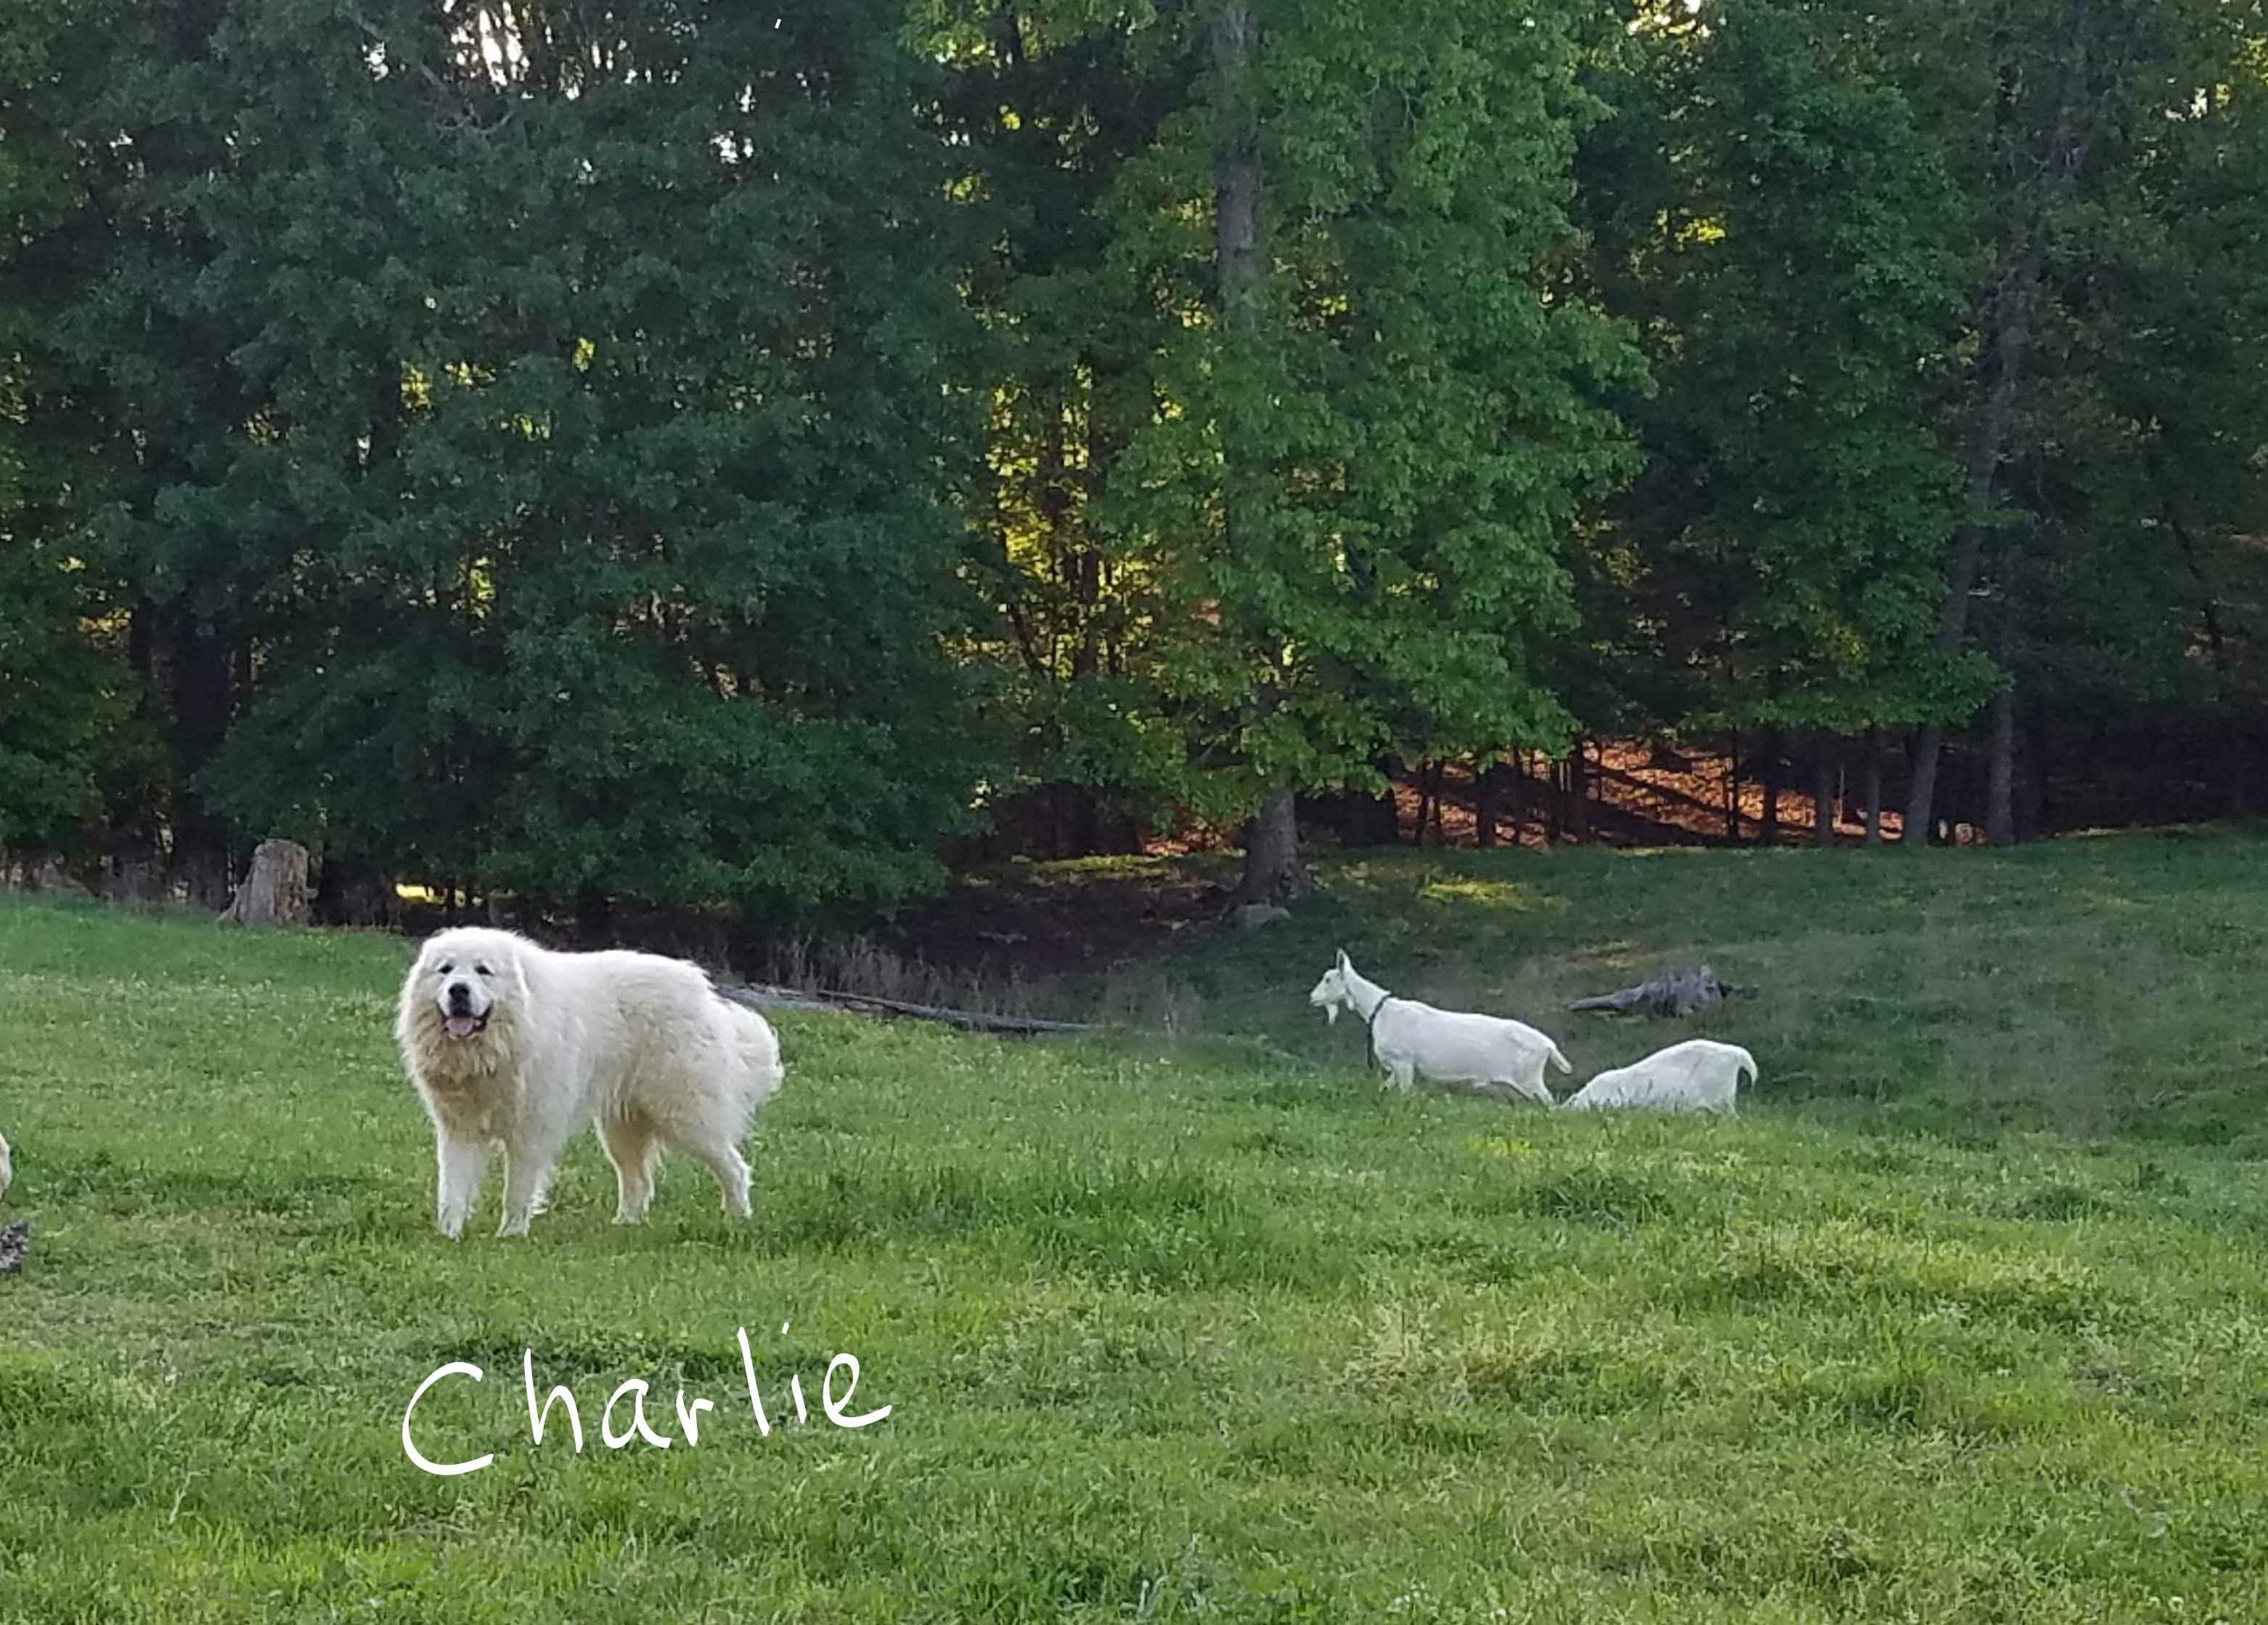 Charlie, sire